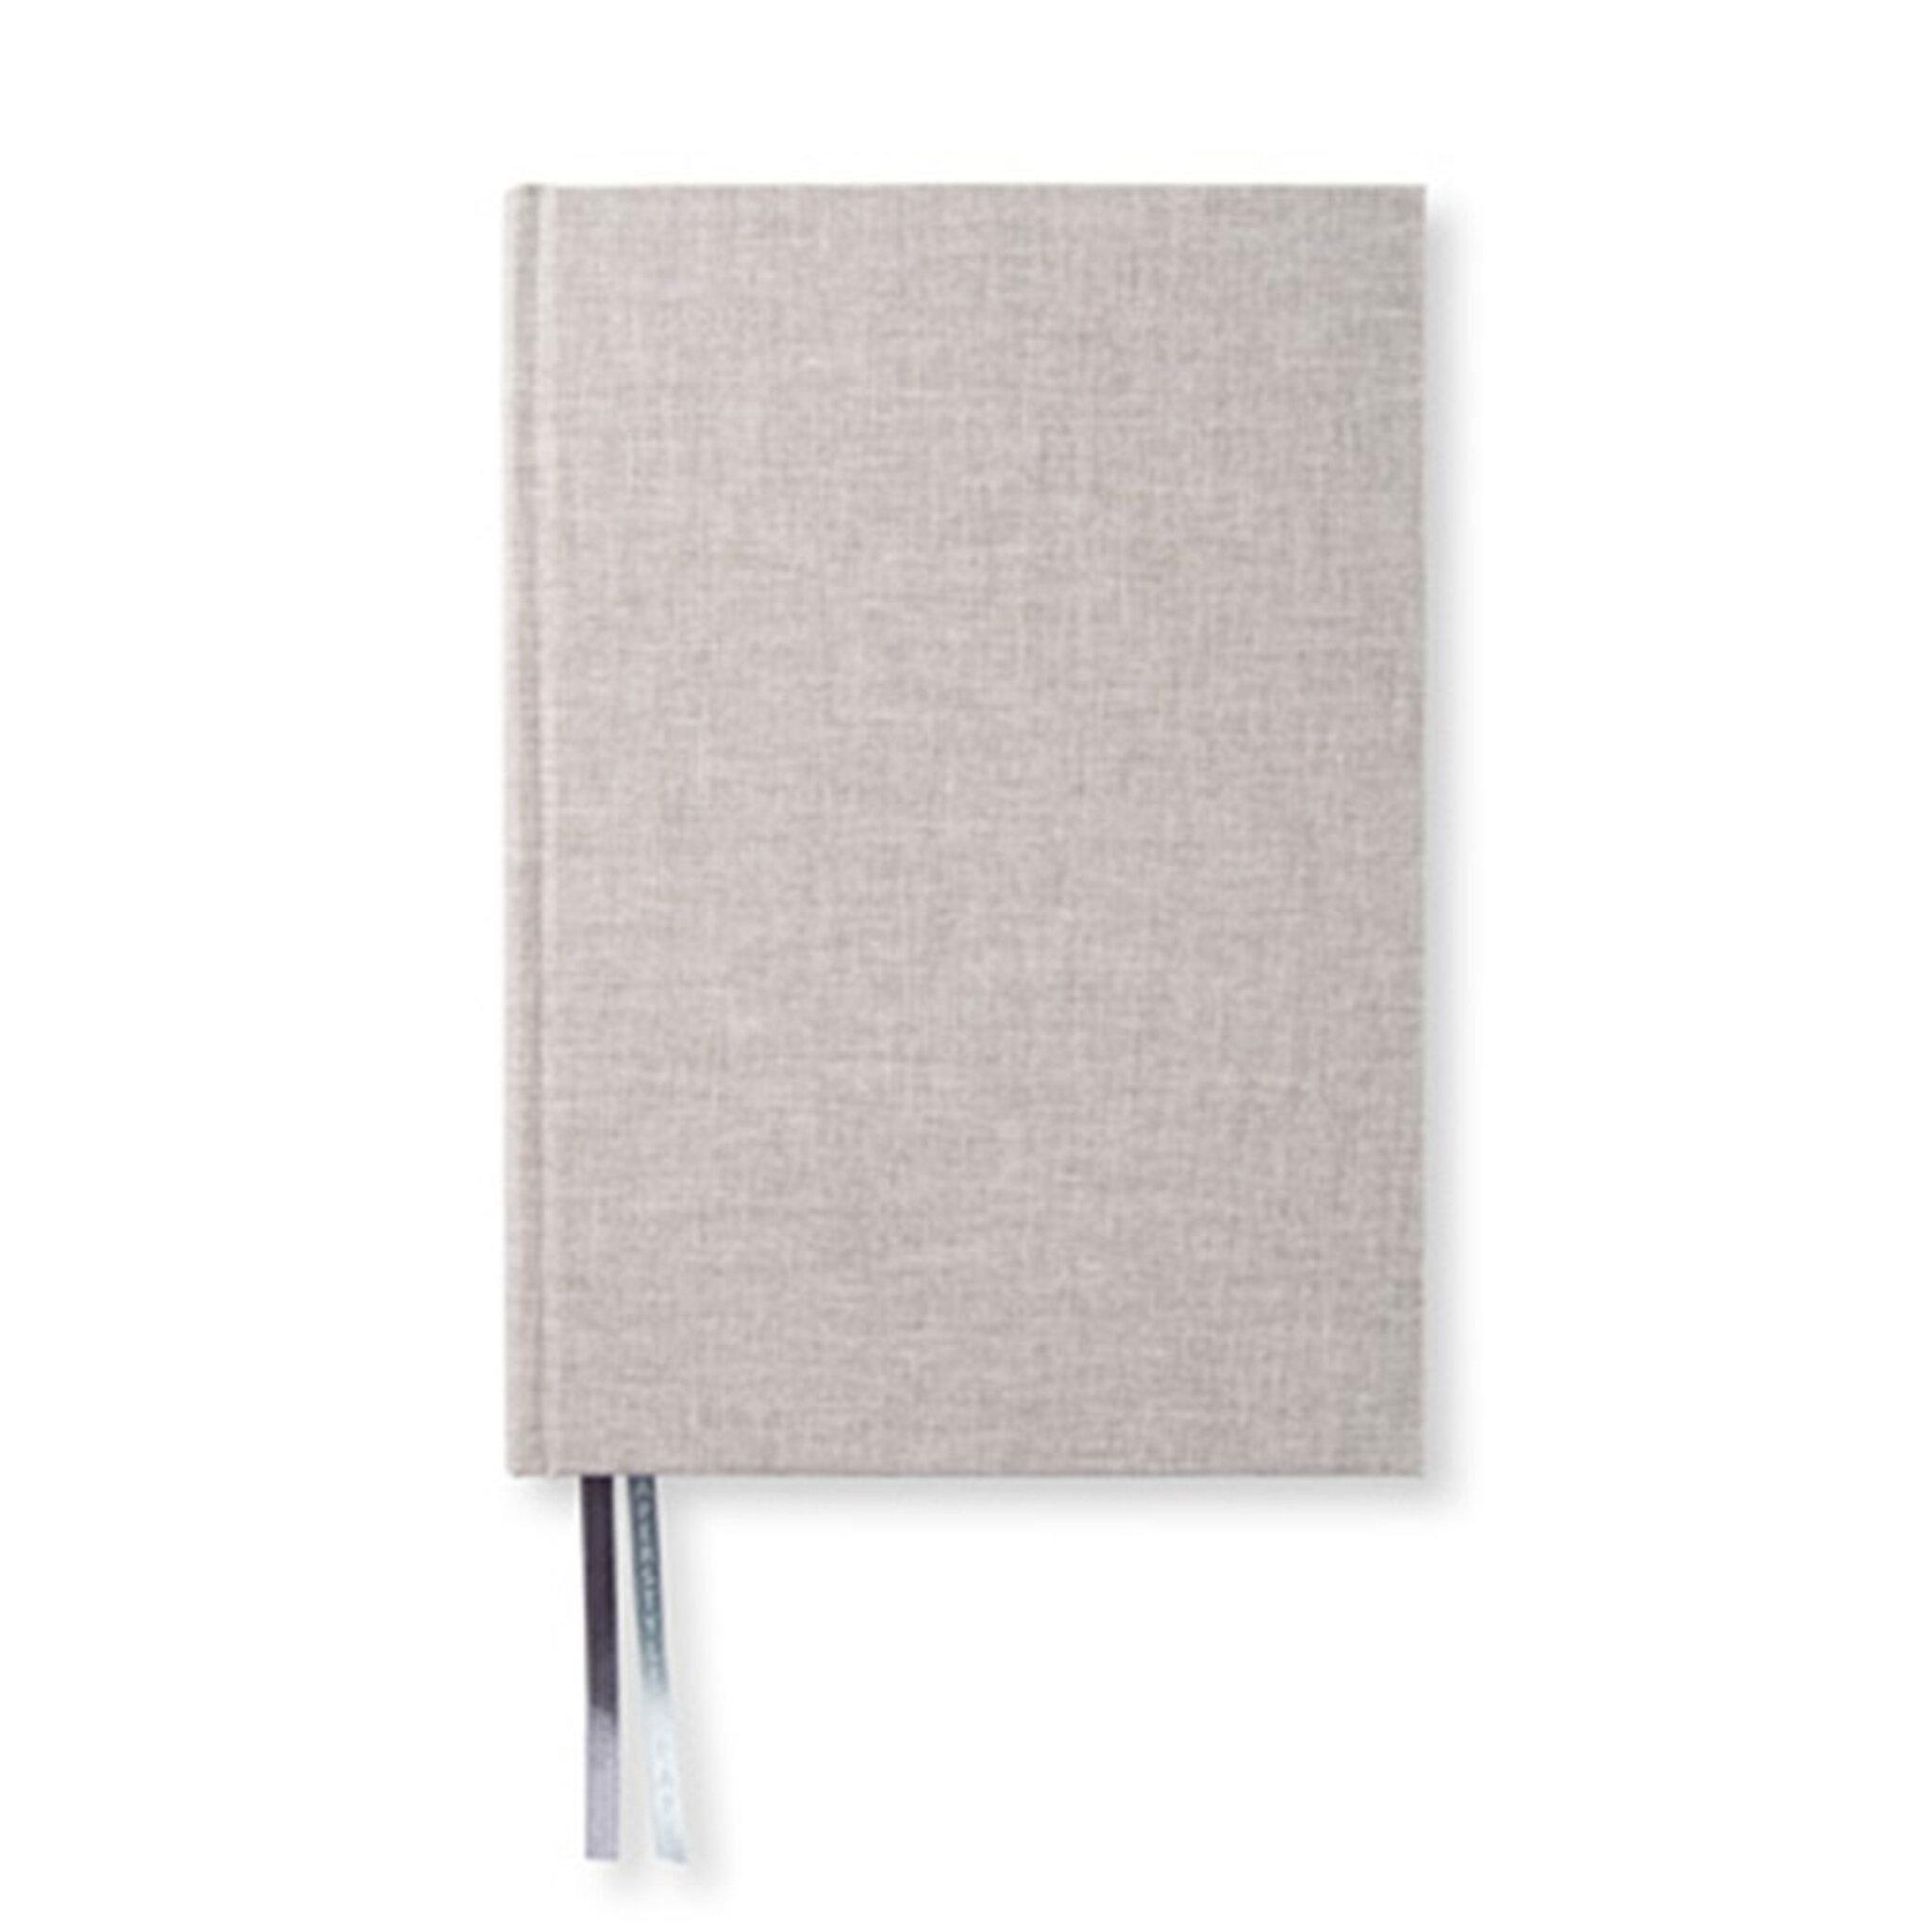 Anteckningsbok A5, 256 linjerade sidor, natur, 21,5X15,5